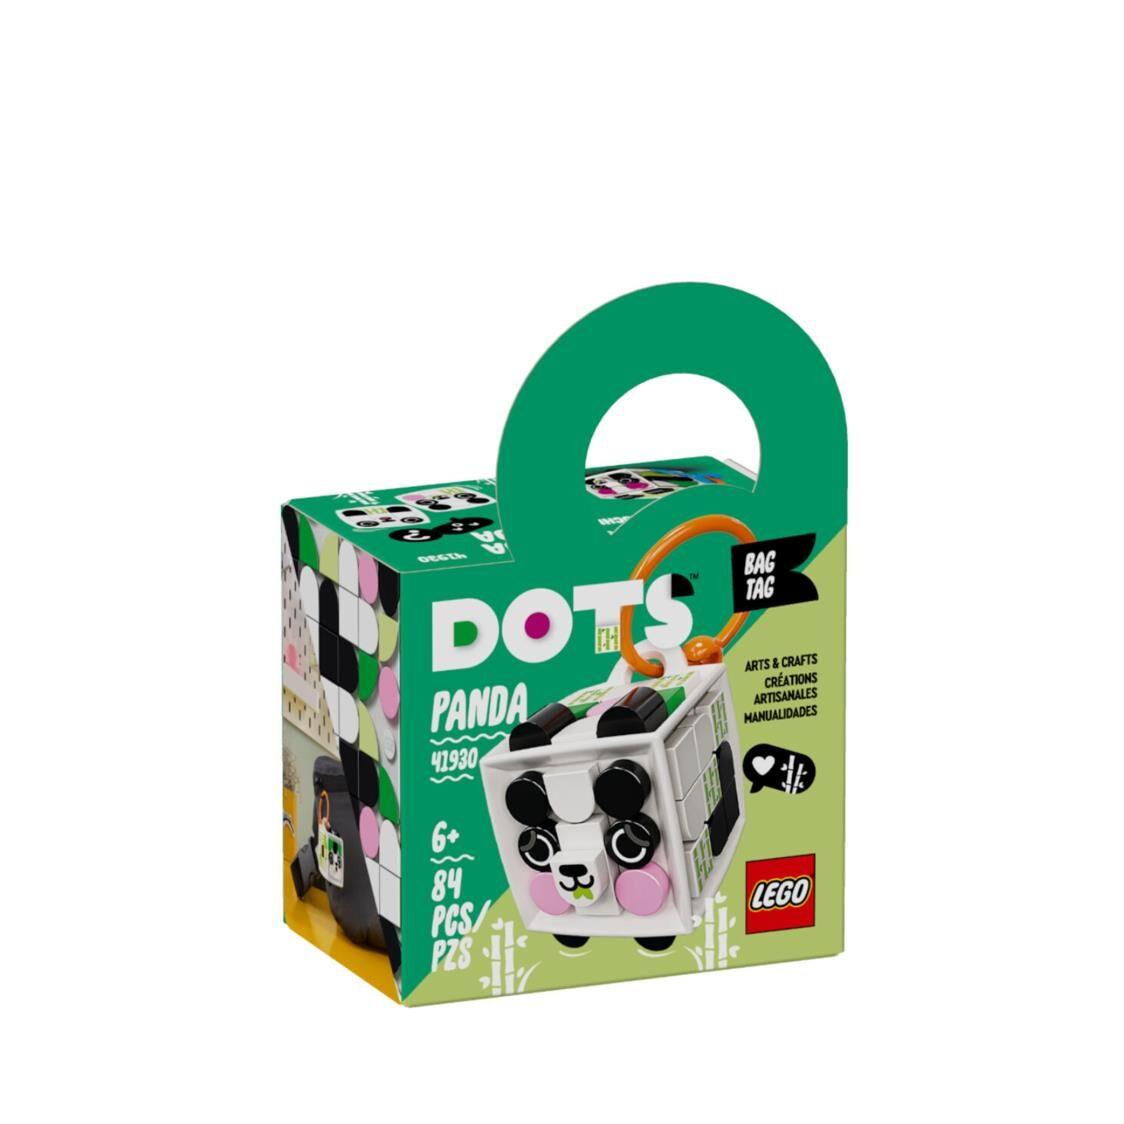 LEGO DOTS - Bag Tag Panda 41930